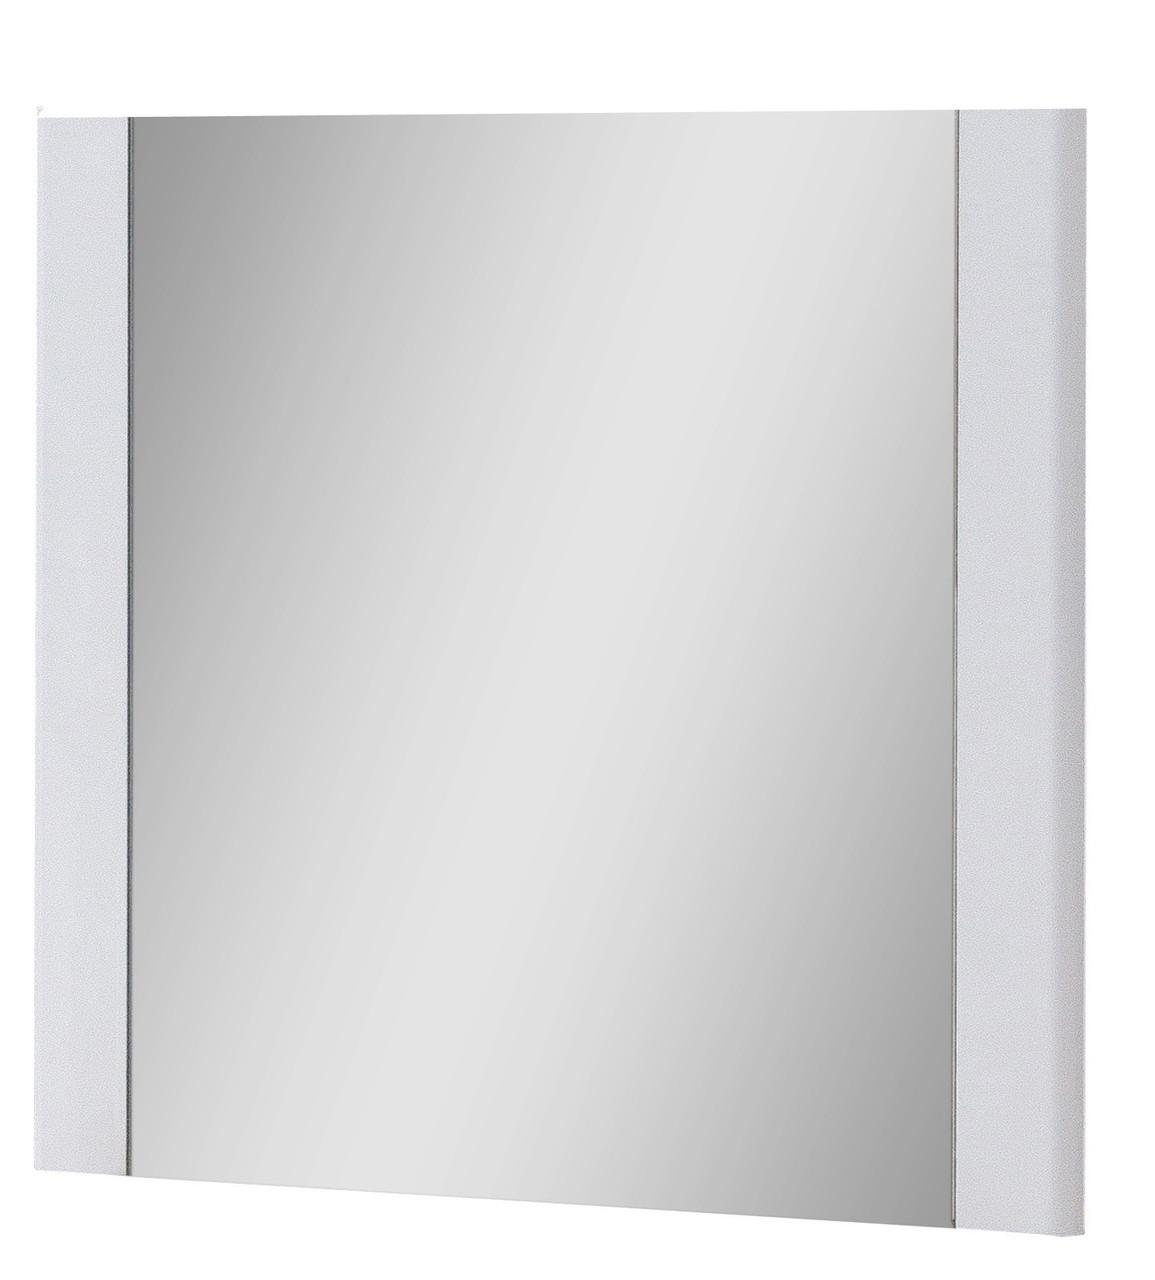 Зеркало для ванной комнаты Z-Эльба 70 (без подсветки) Юввис